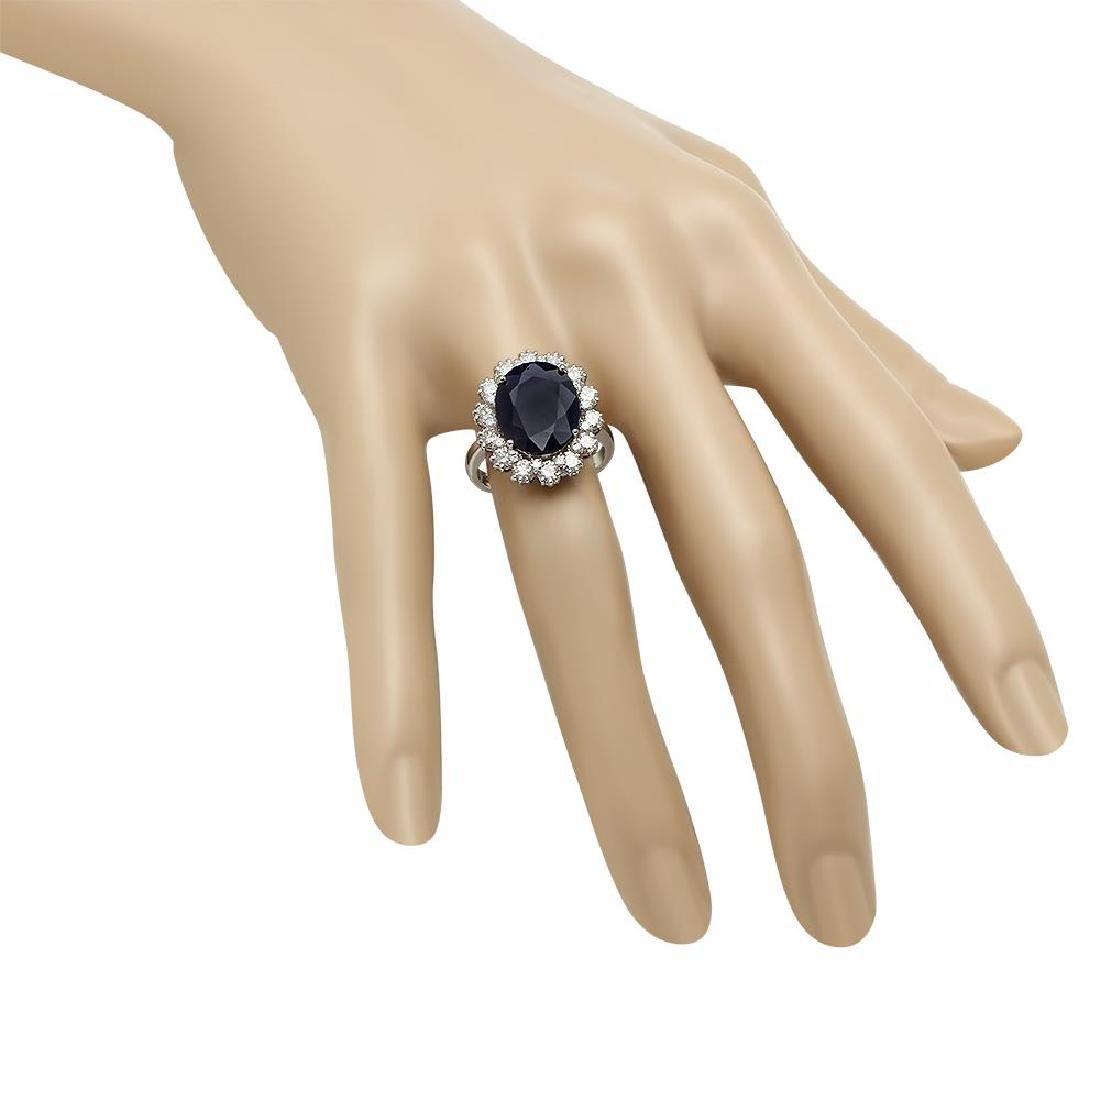 14K Gold 6.27ct Sapphire 1.63ct Diamond Ring - 3